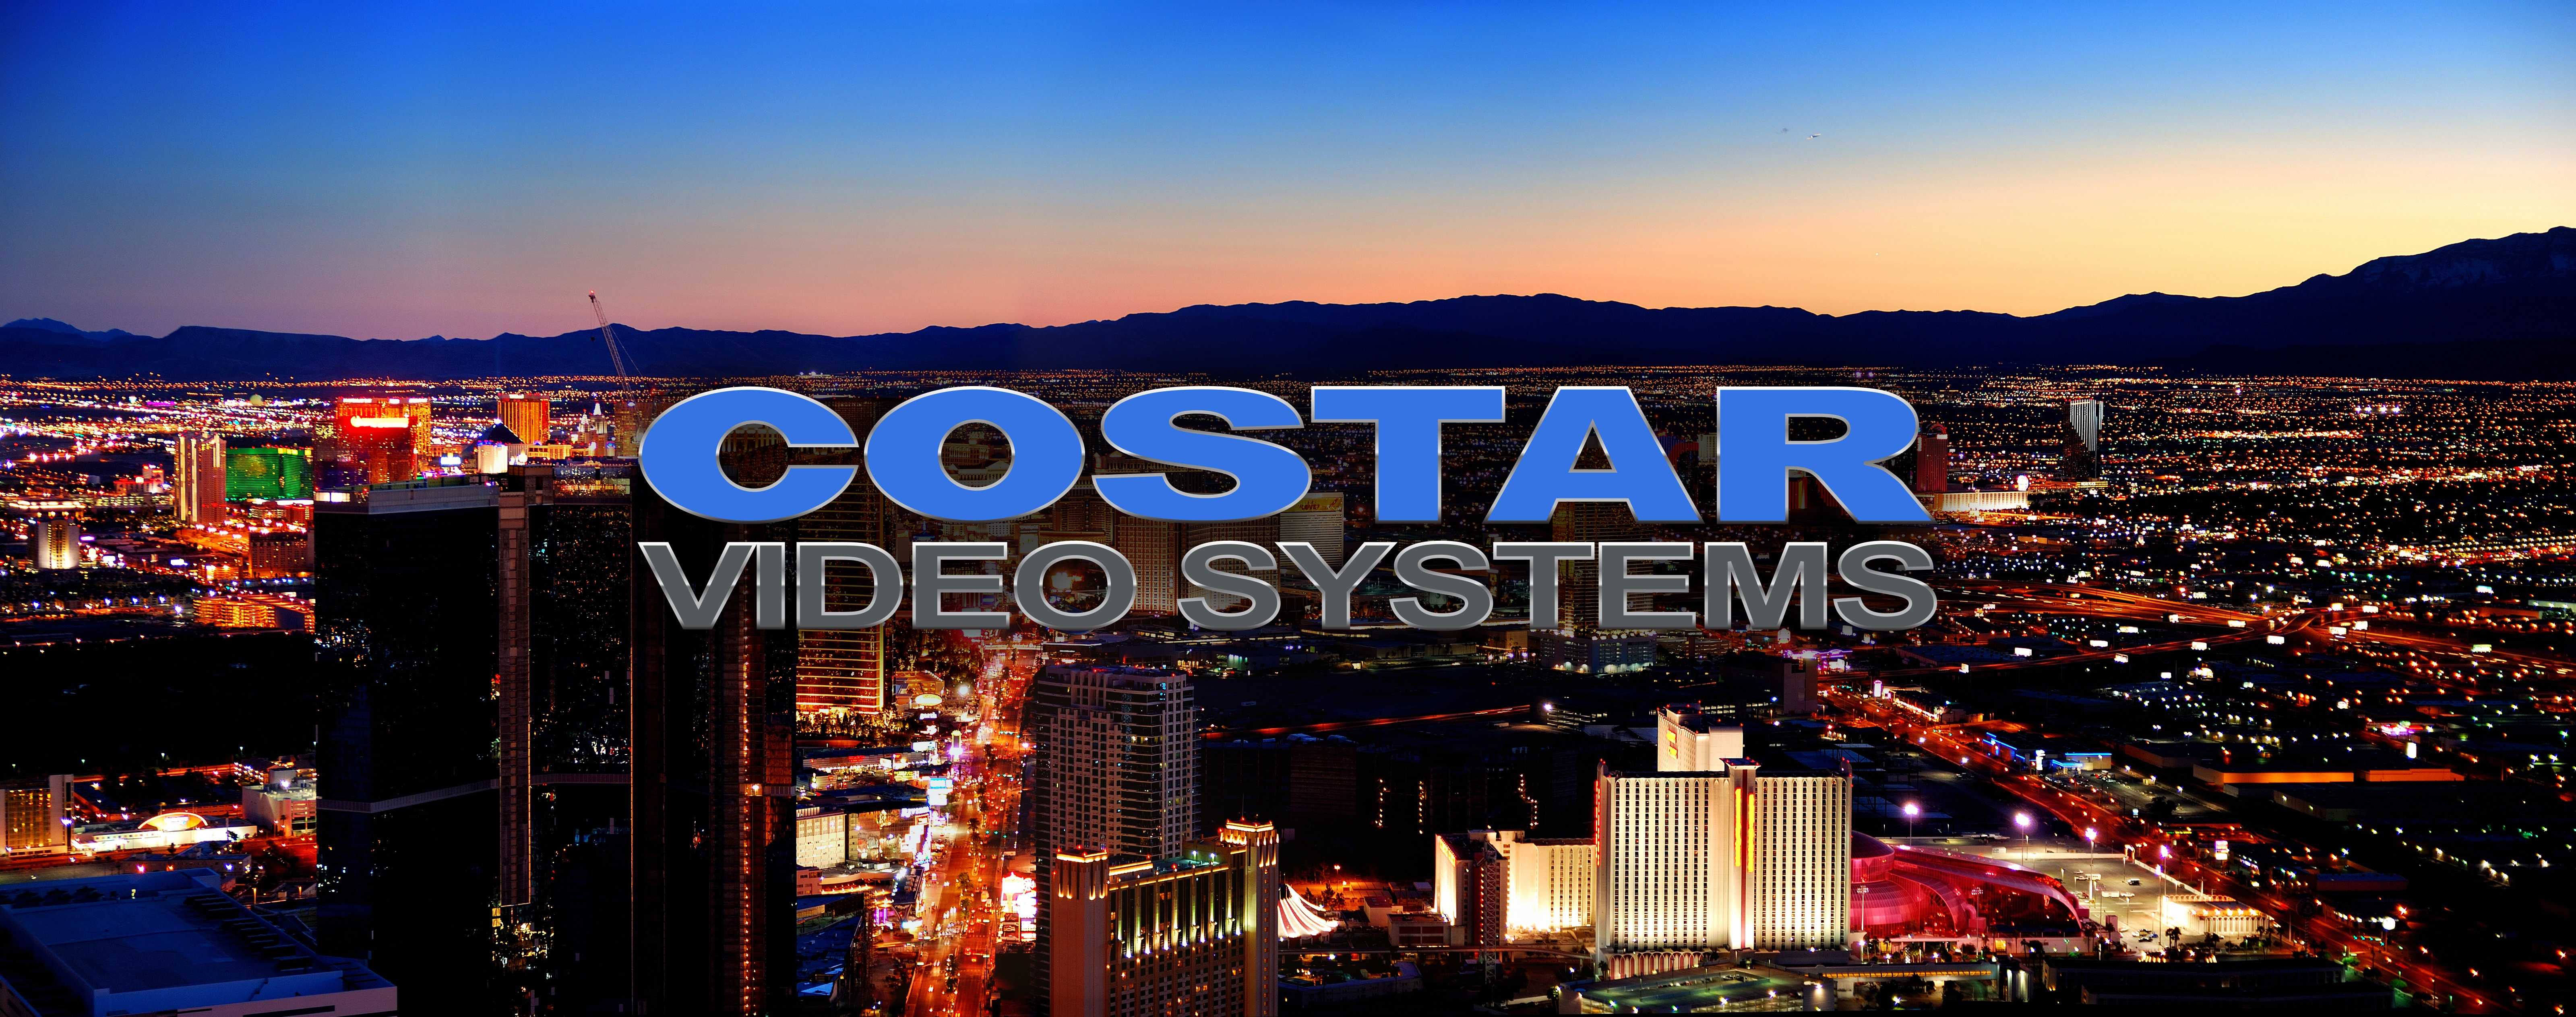 Costar Video Systems Las Vegas.jpg